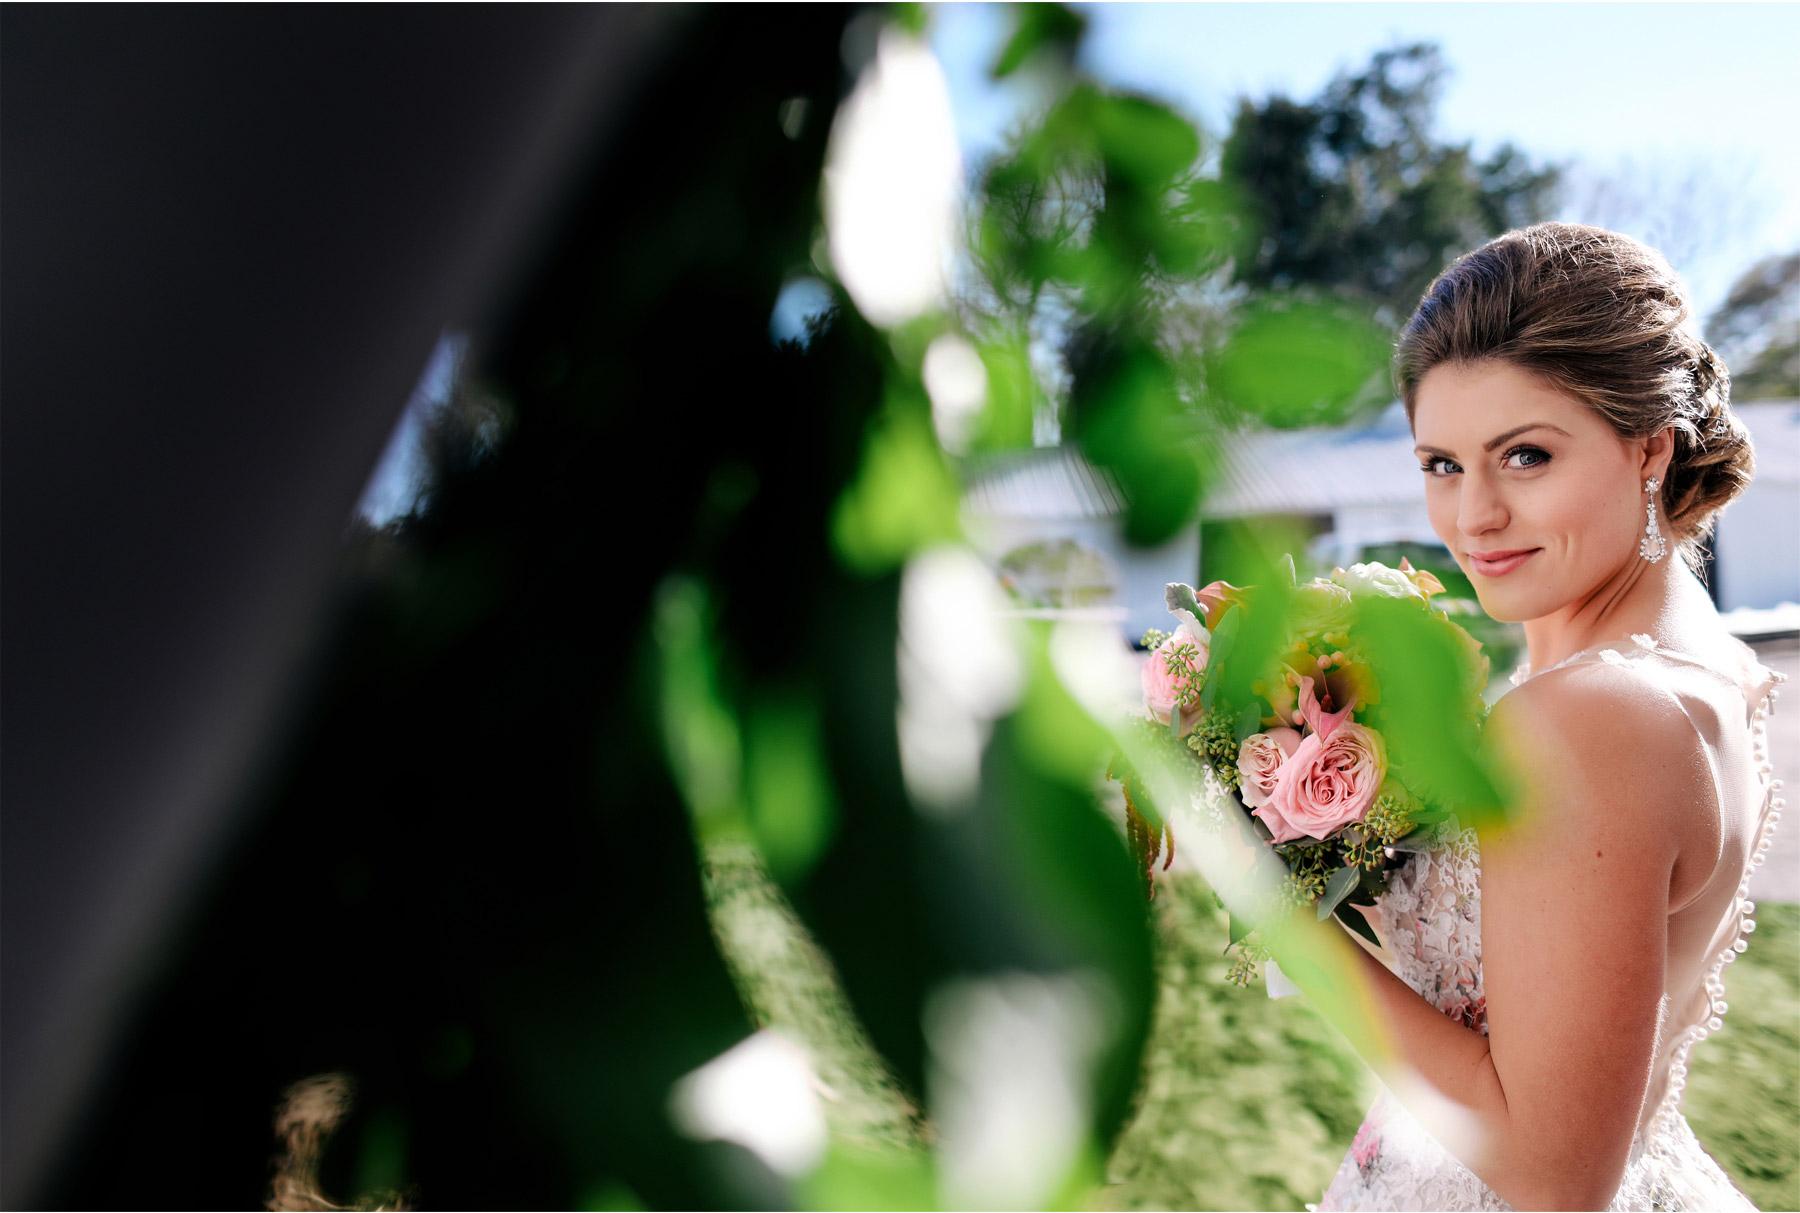 08-Ashery-Lane-Farm-Minneapolis-Minnesota-Wedding-Styled-Shoot-New-Venue-Barn-Orchard-Vineyard.jpg